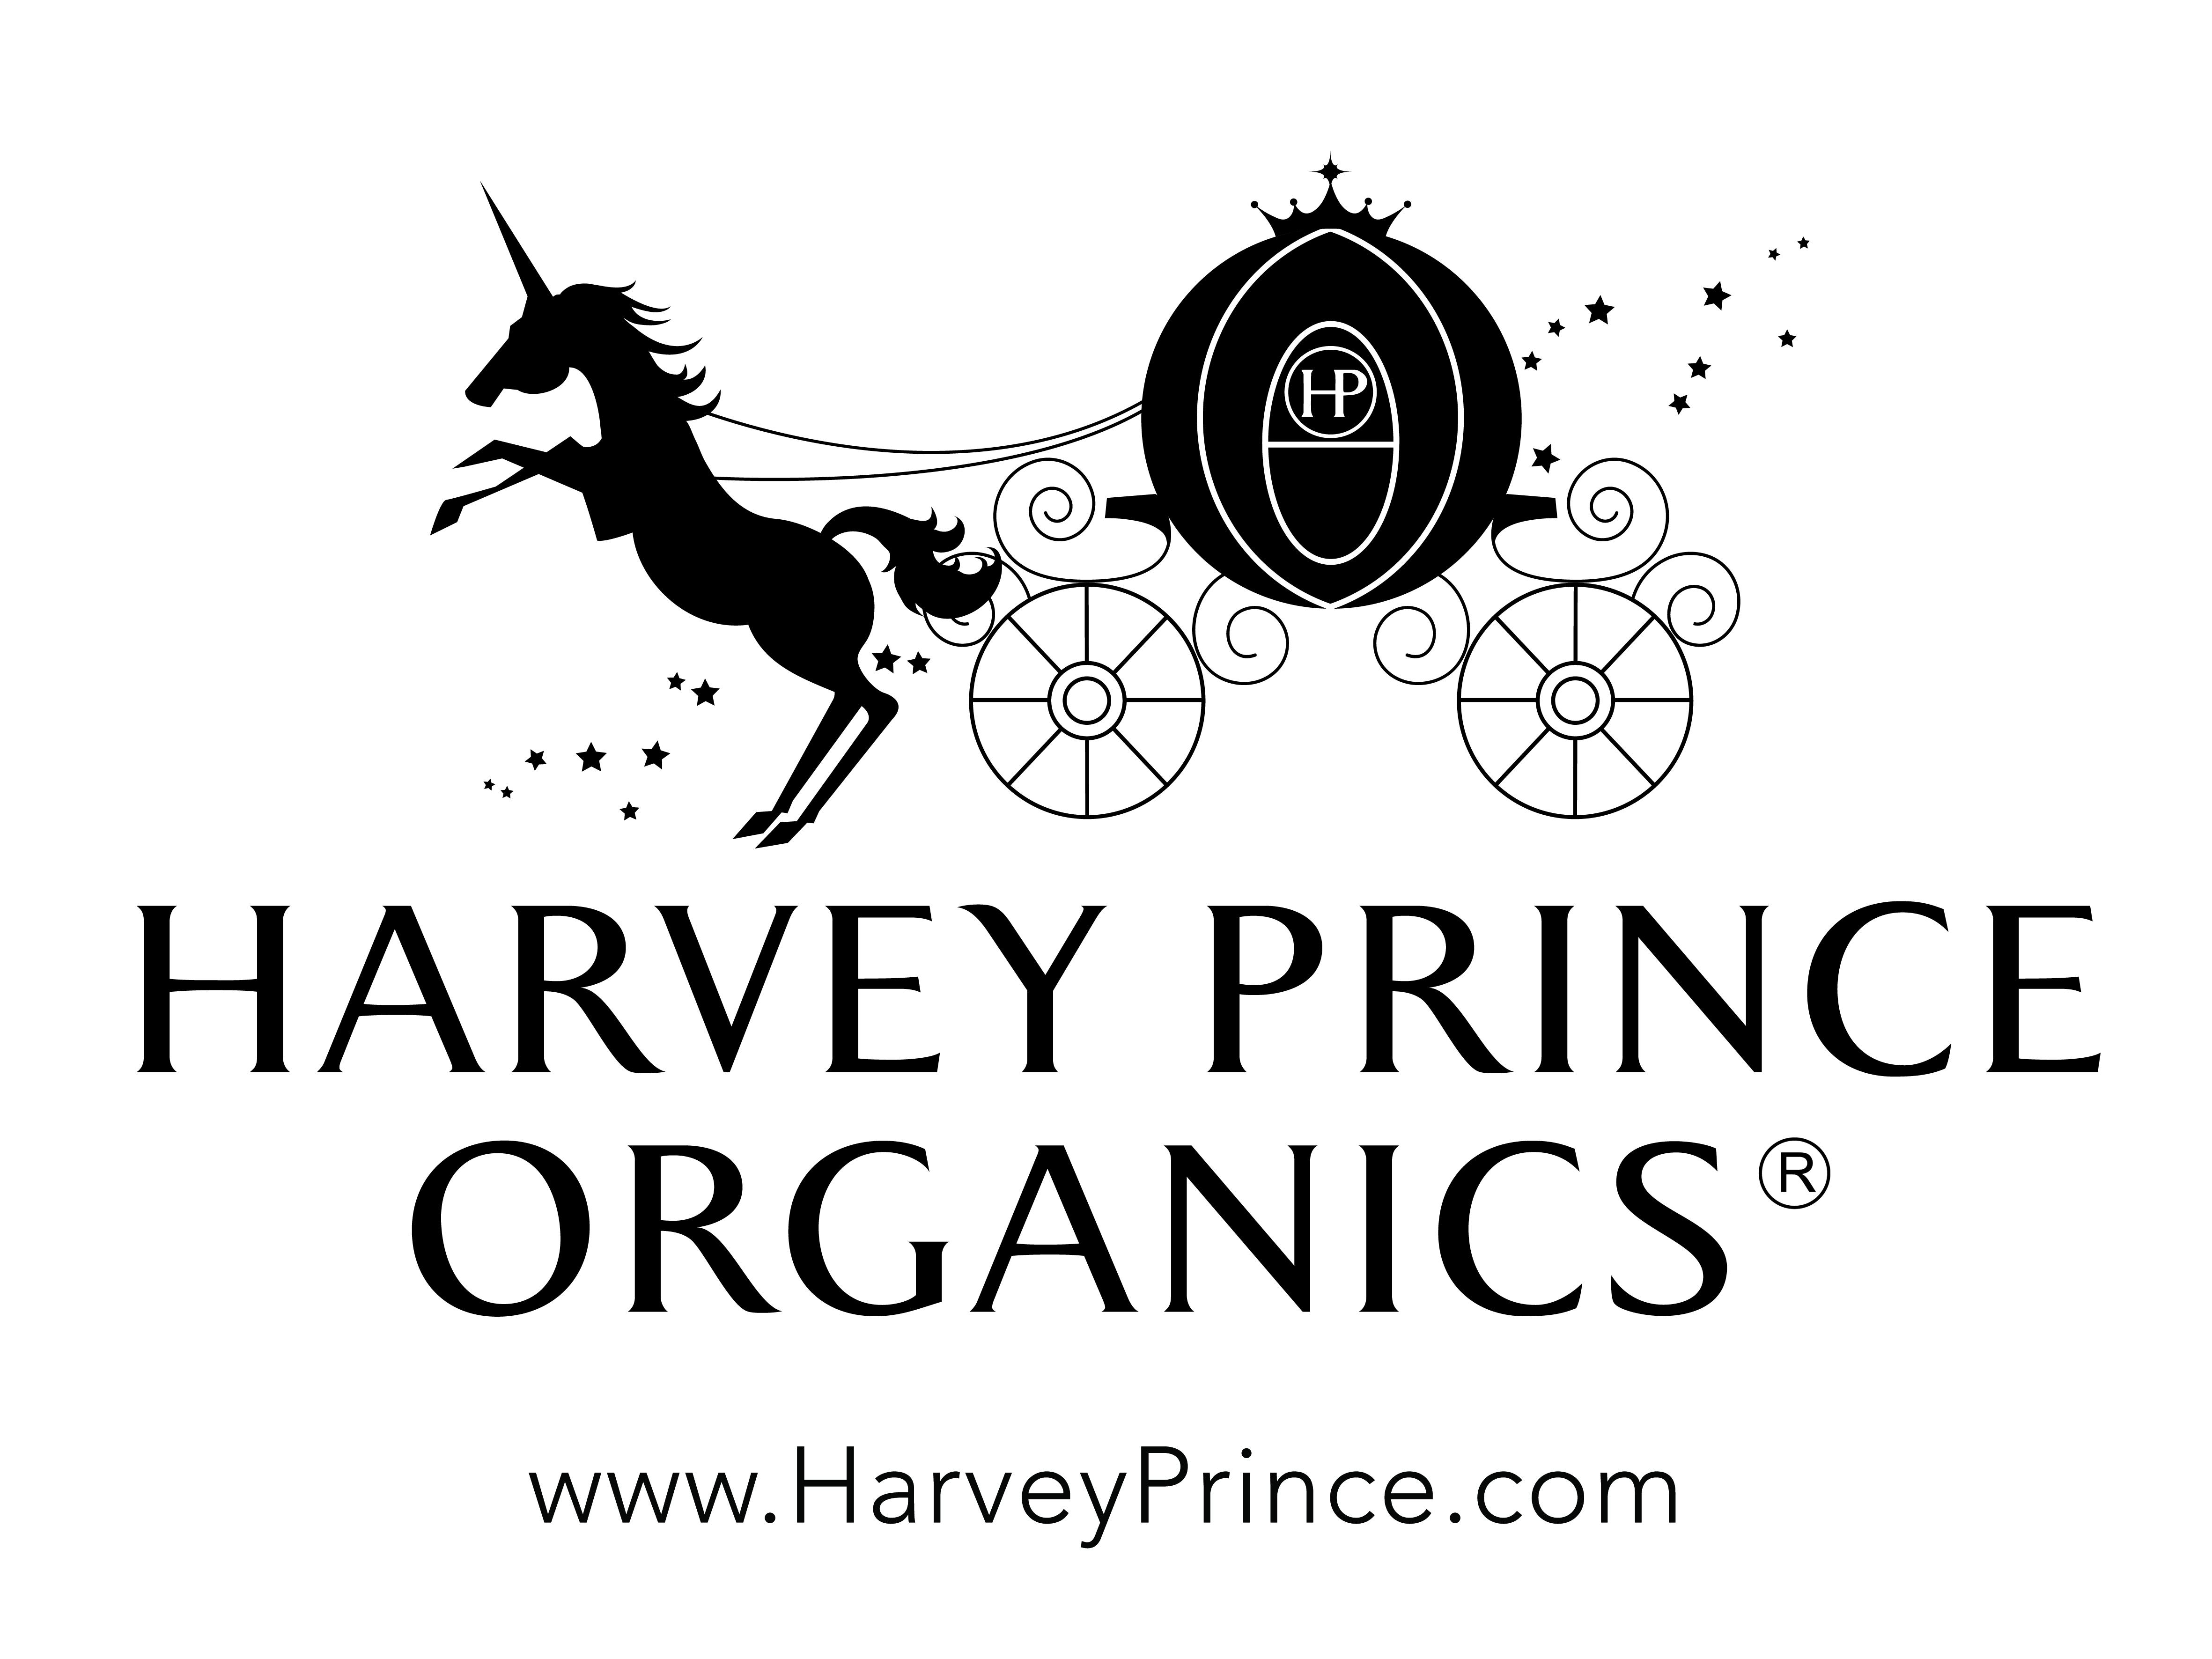 Harvey Prince Organics